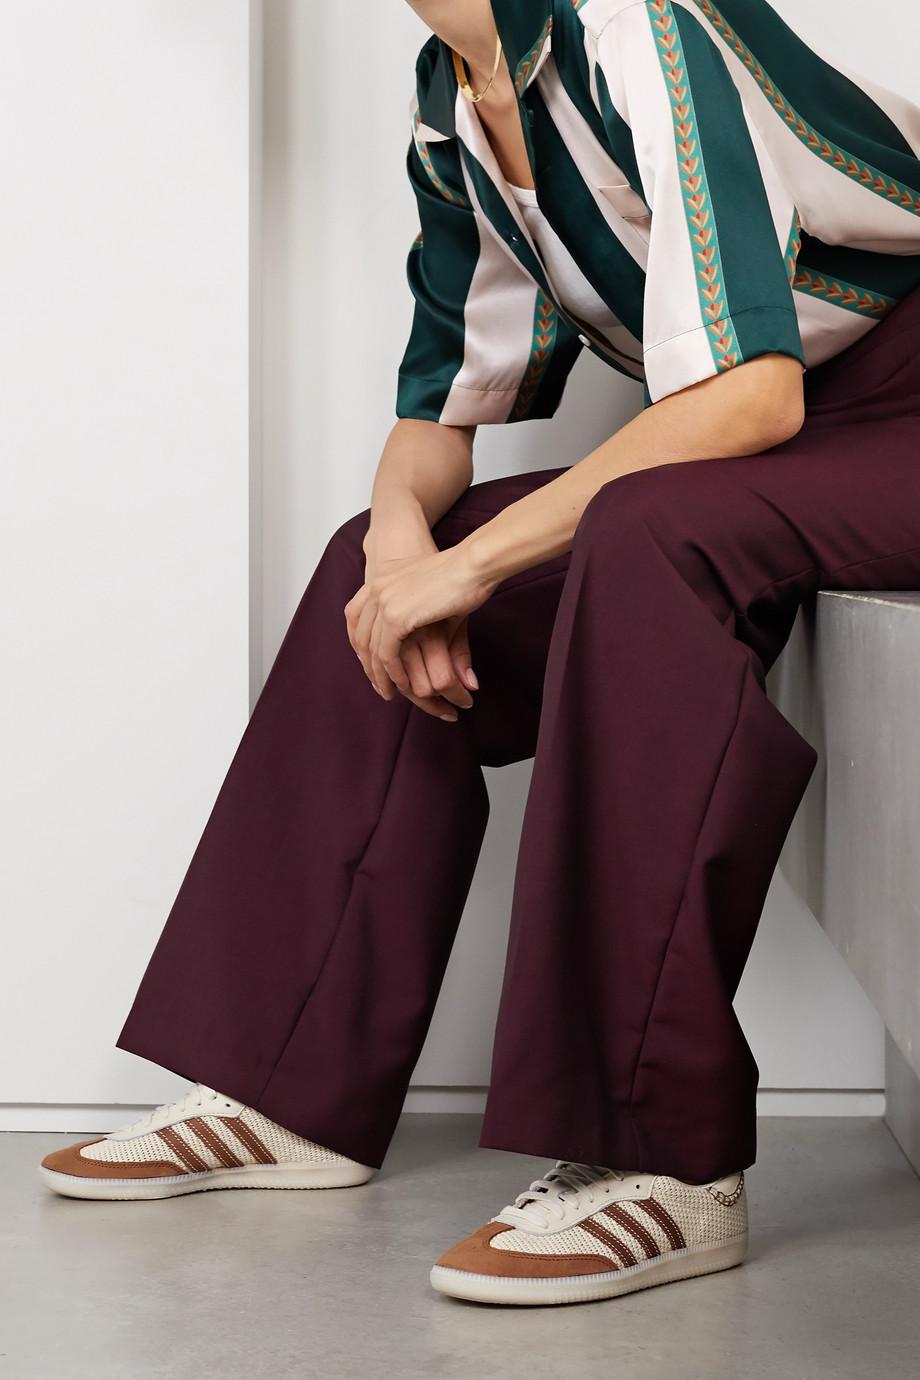 adidas Originals + Wales Bonner Samba Sneakers aus Veloursleder, Leder und Mesh